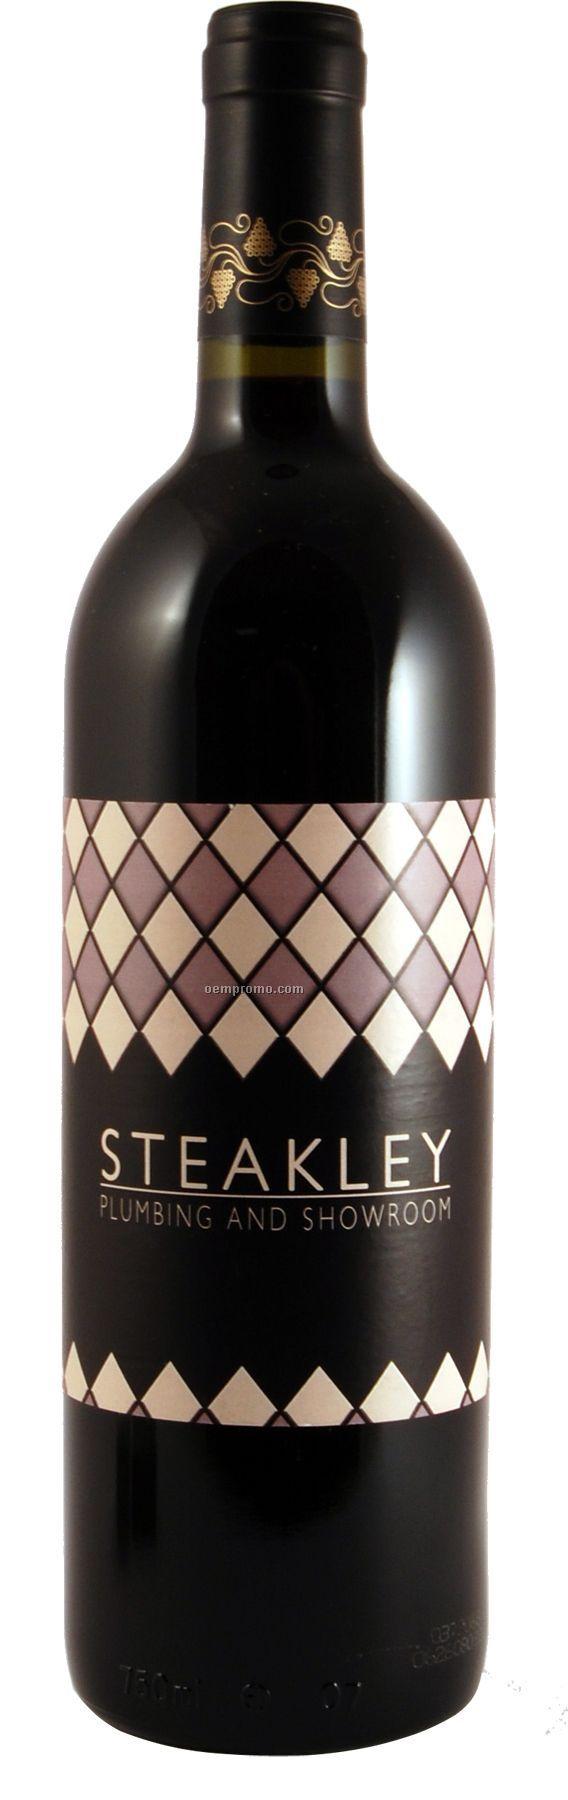 2007 Wv Syrah, Mendocino County Private Reserve (Custom Labeled Wine)